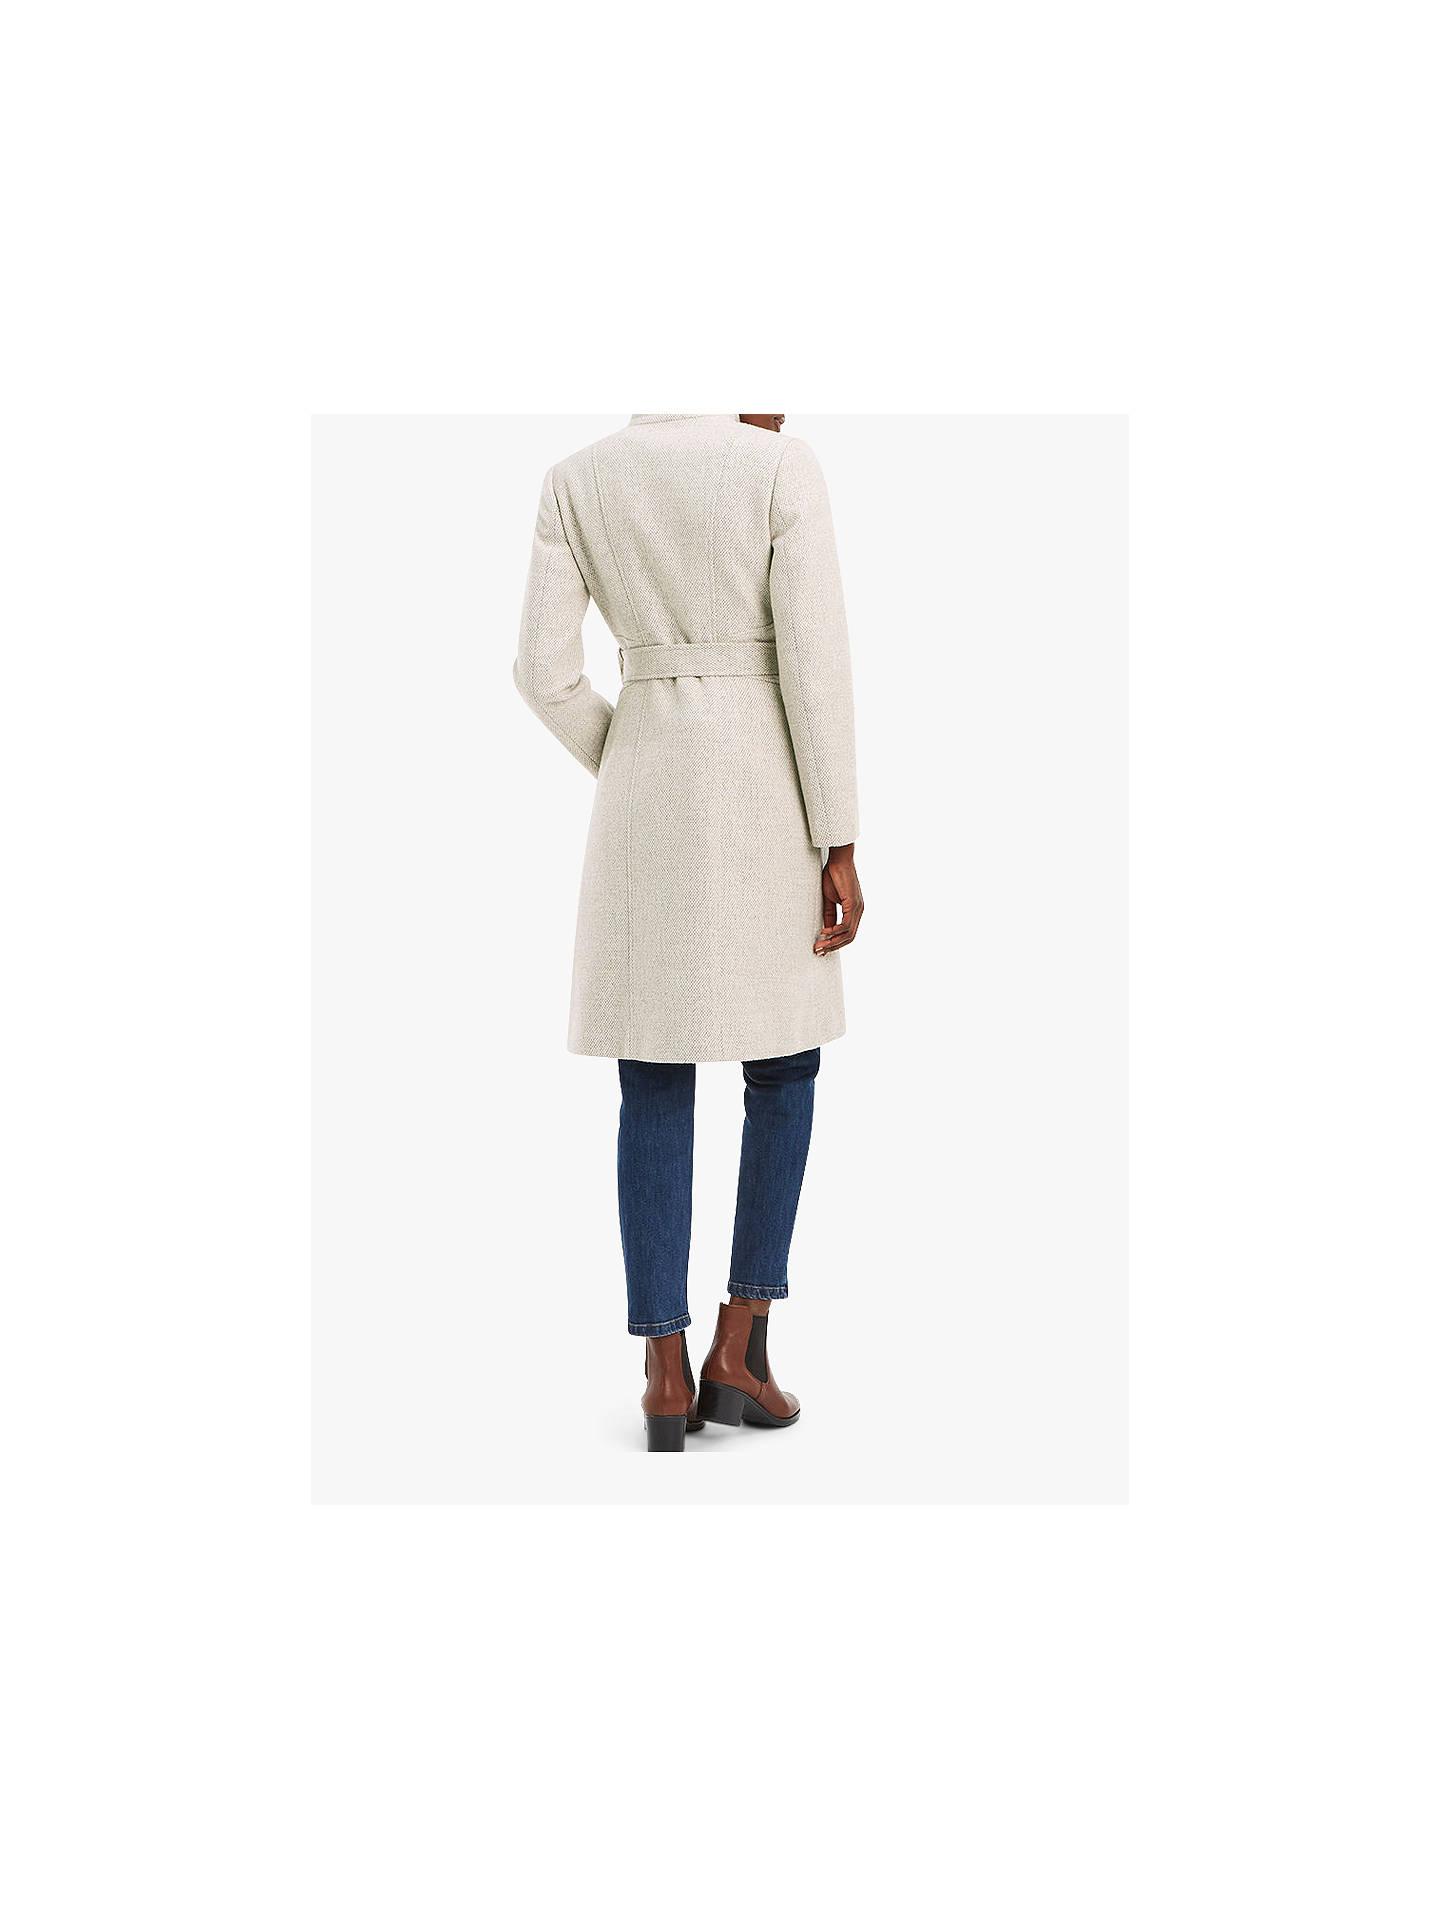 6355eb902beb ... Buy Oasis Panel Coat, Multi, S Online at johnlewis.com ...